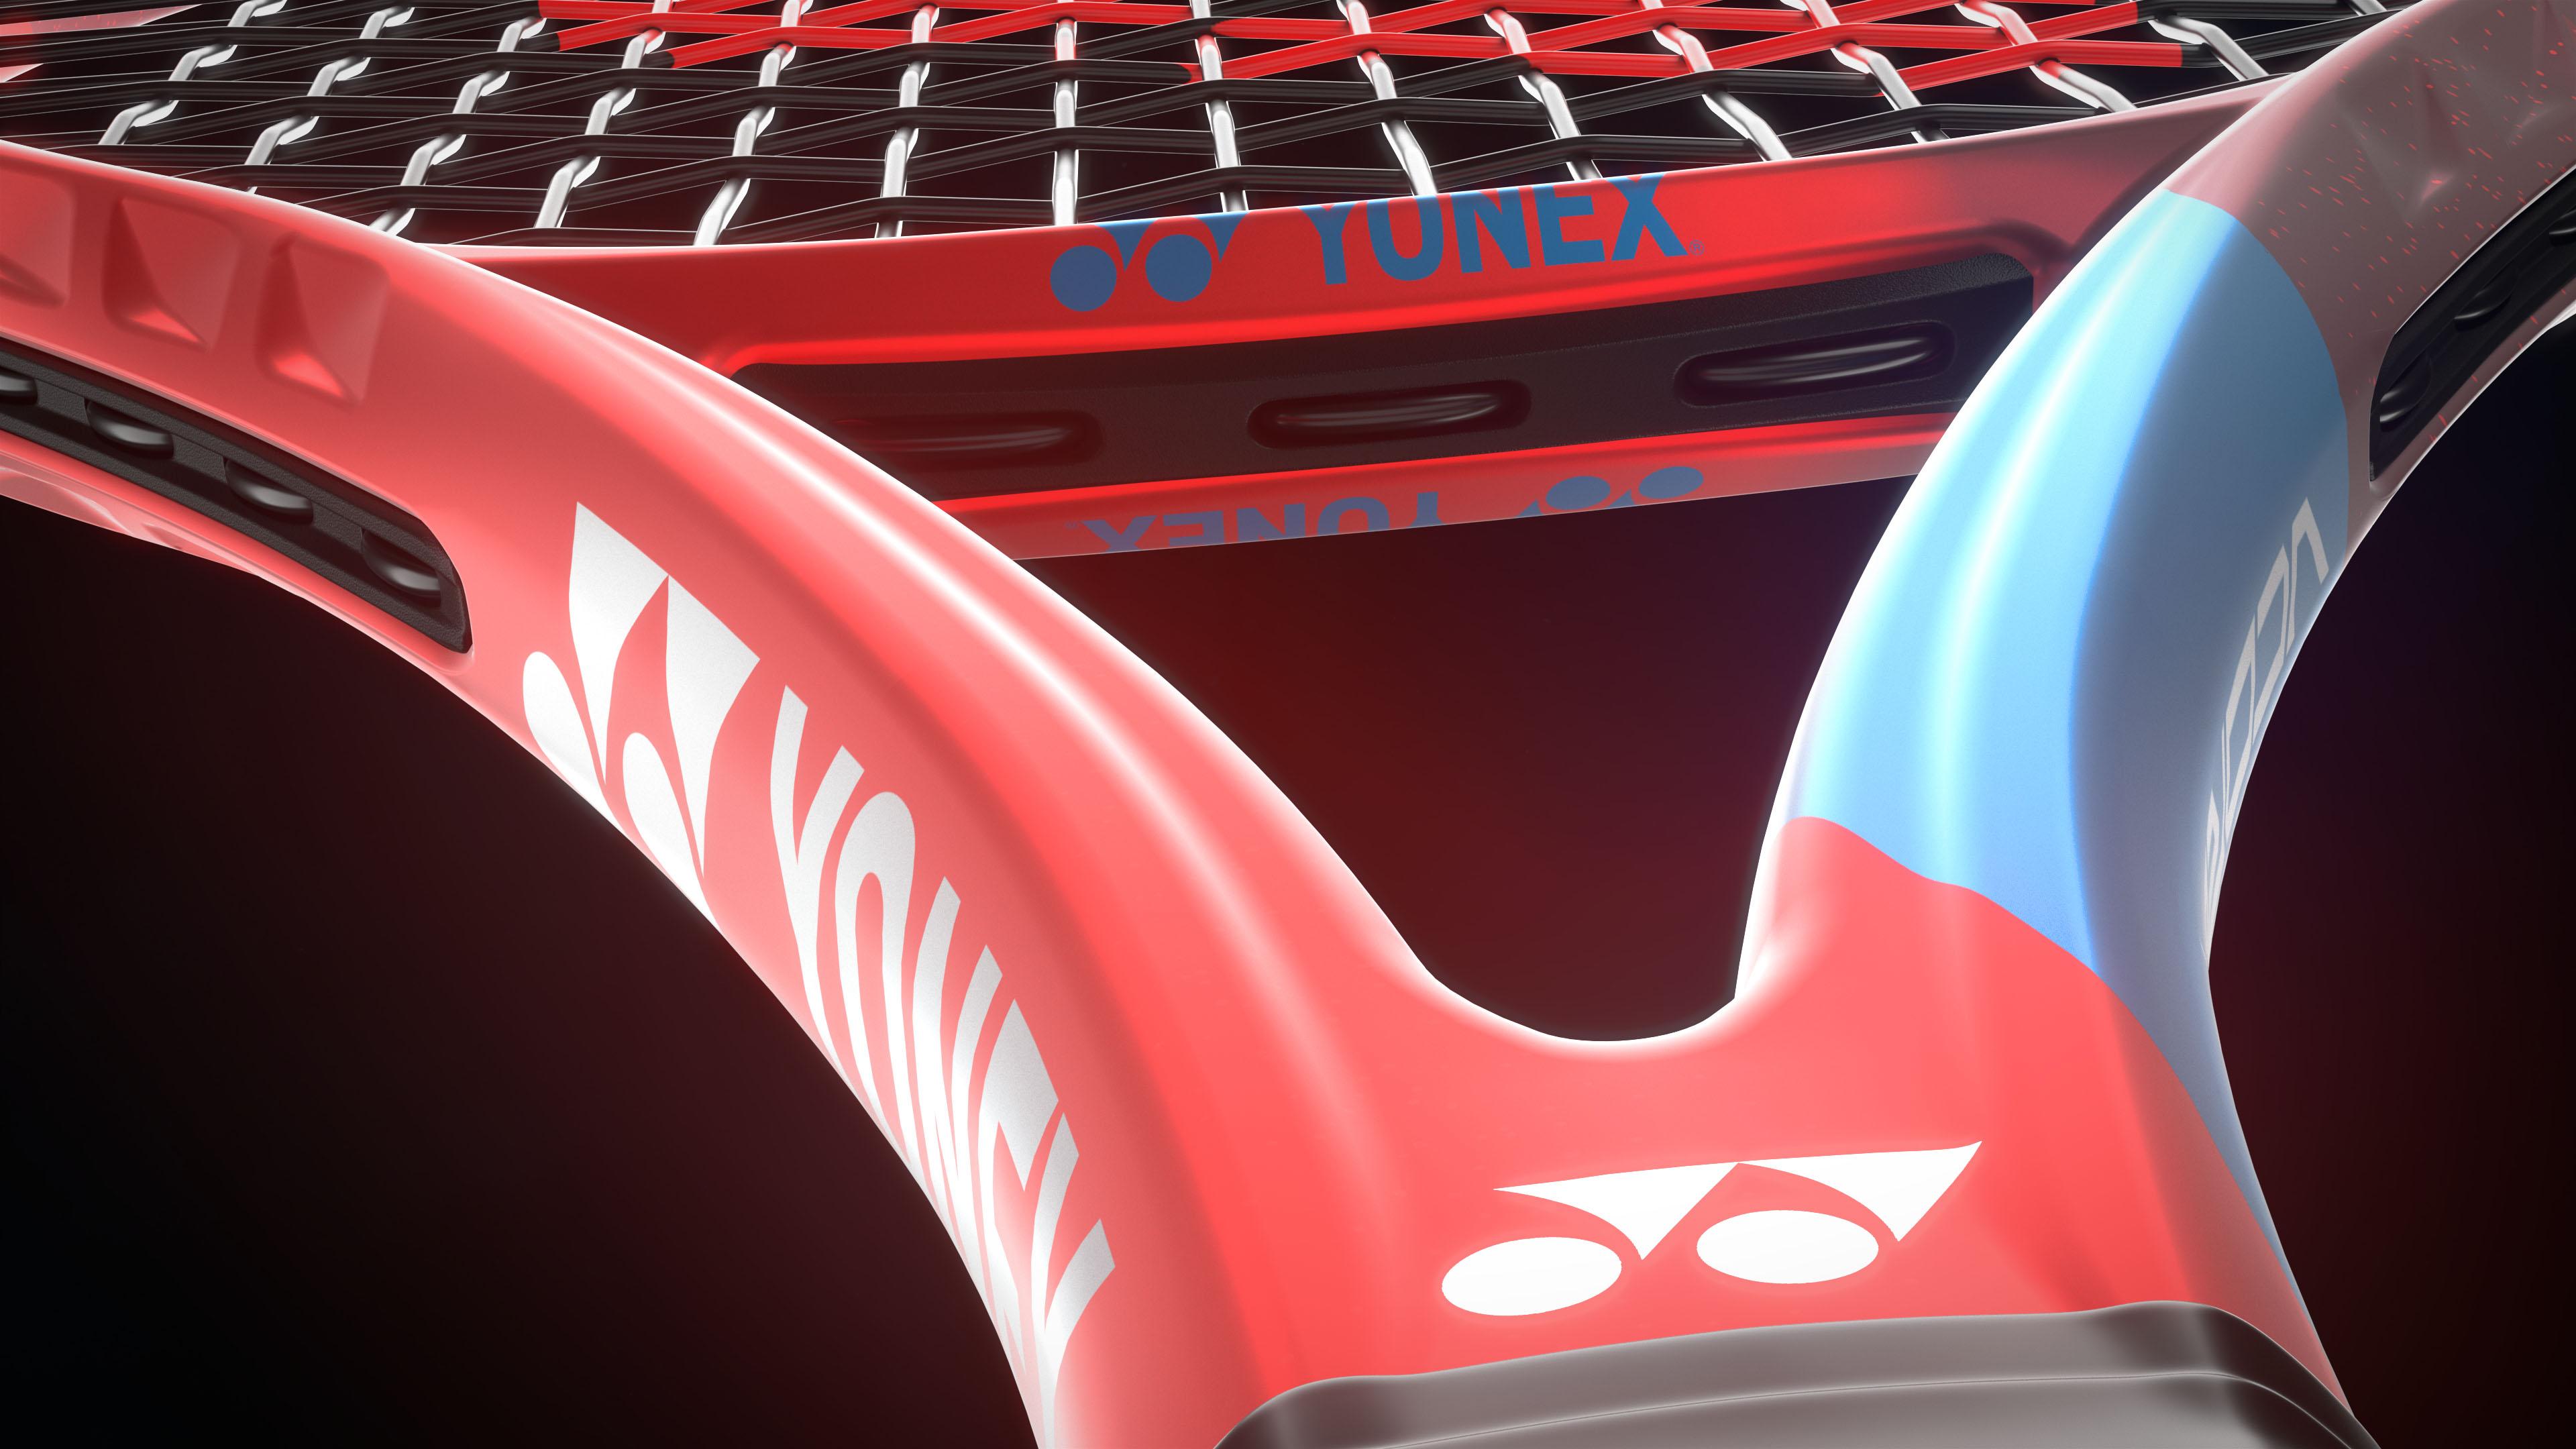 Yonex tennis racket close-up 3D rendering